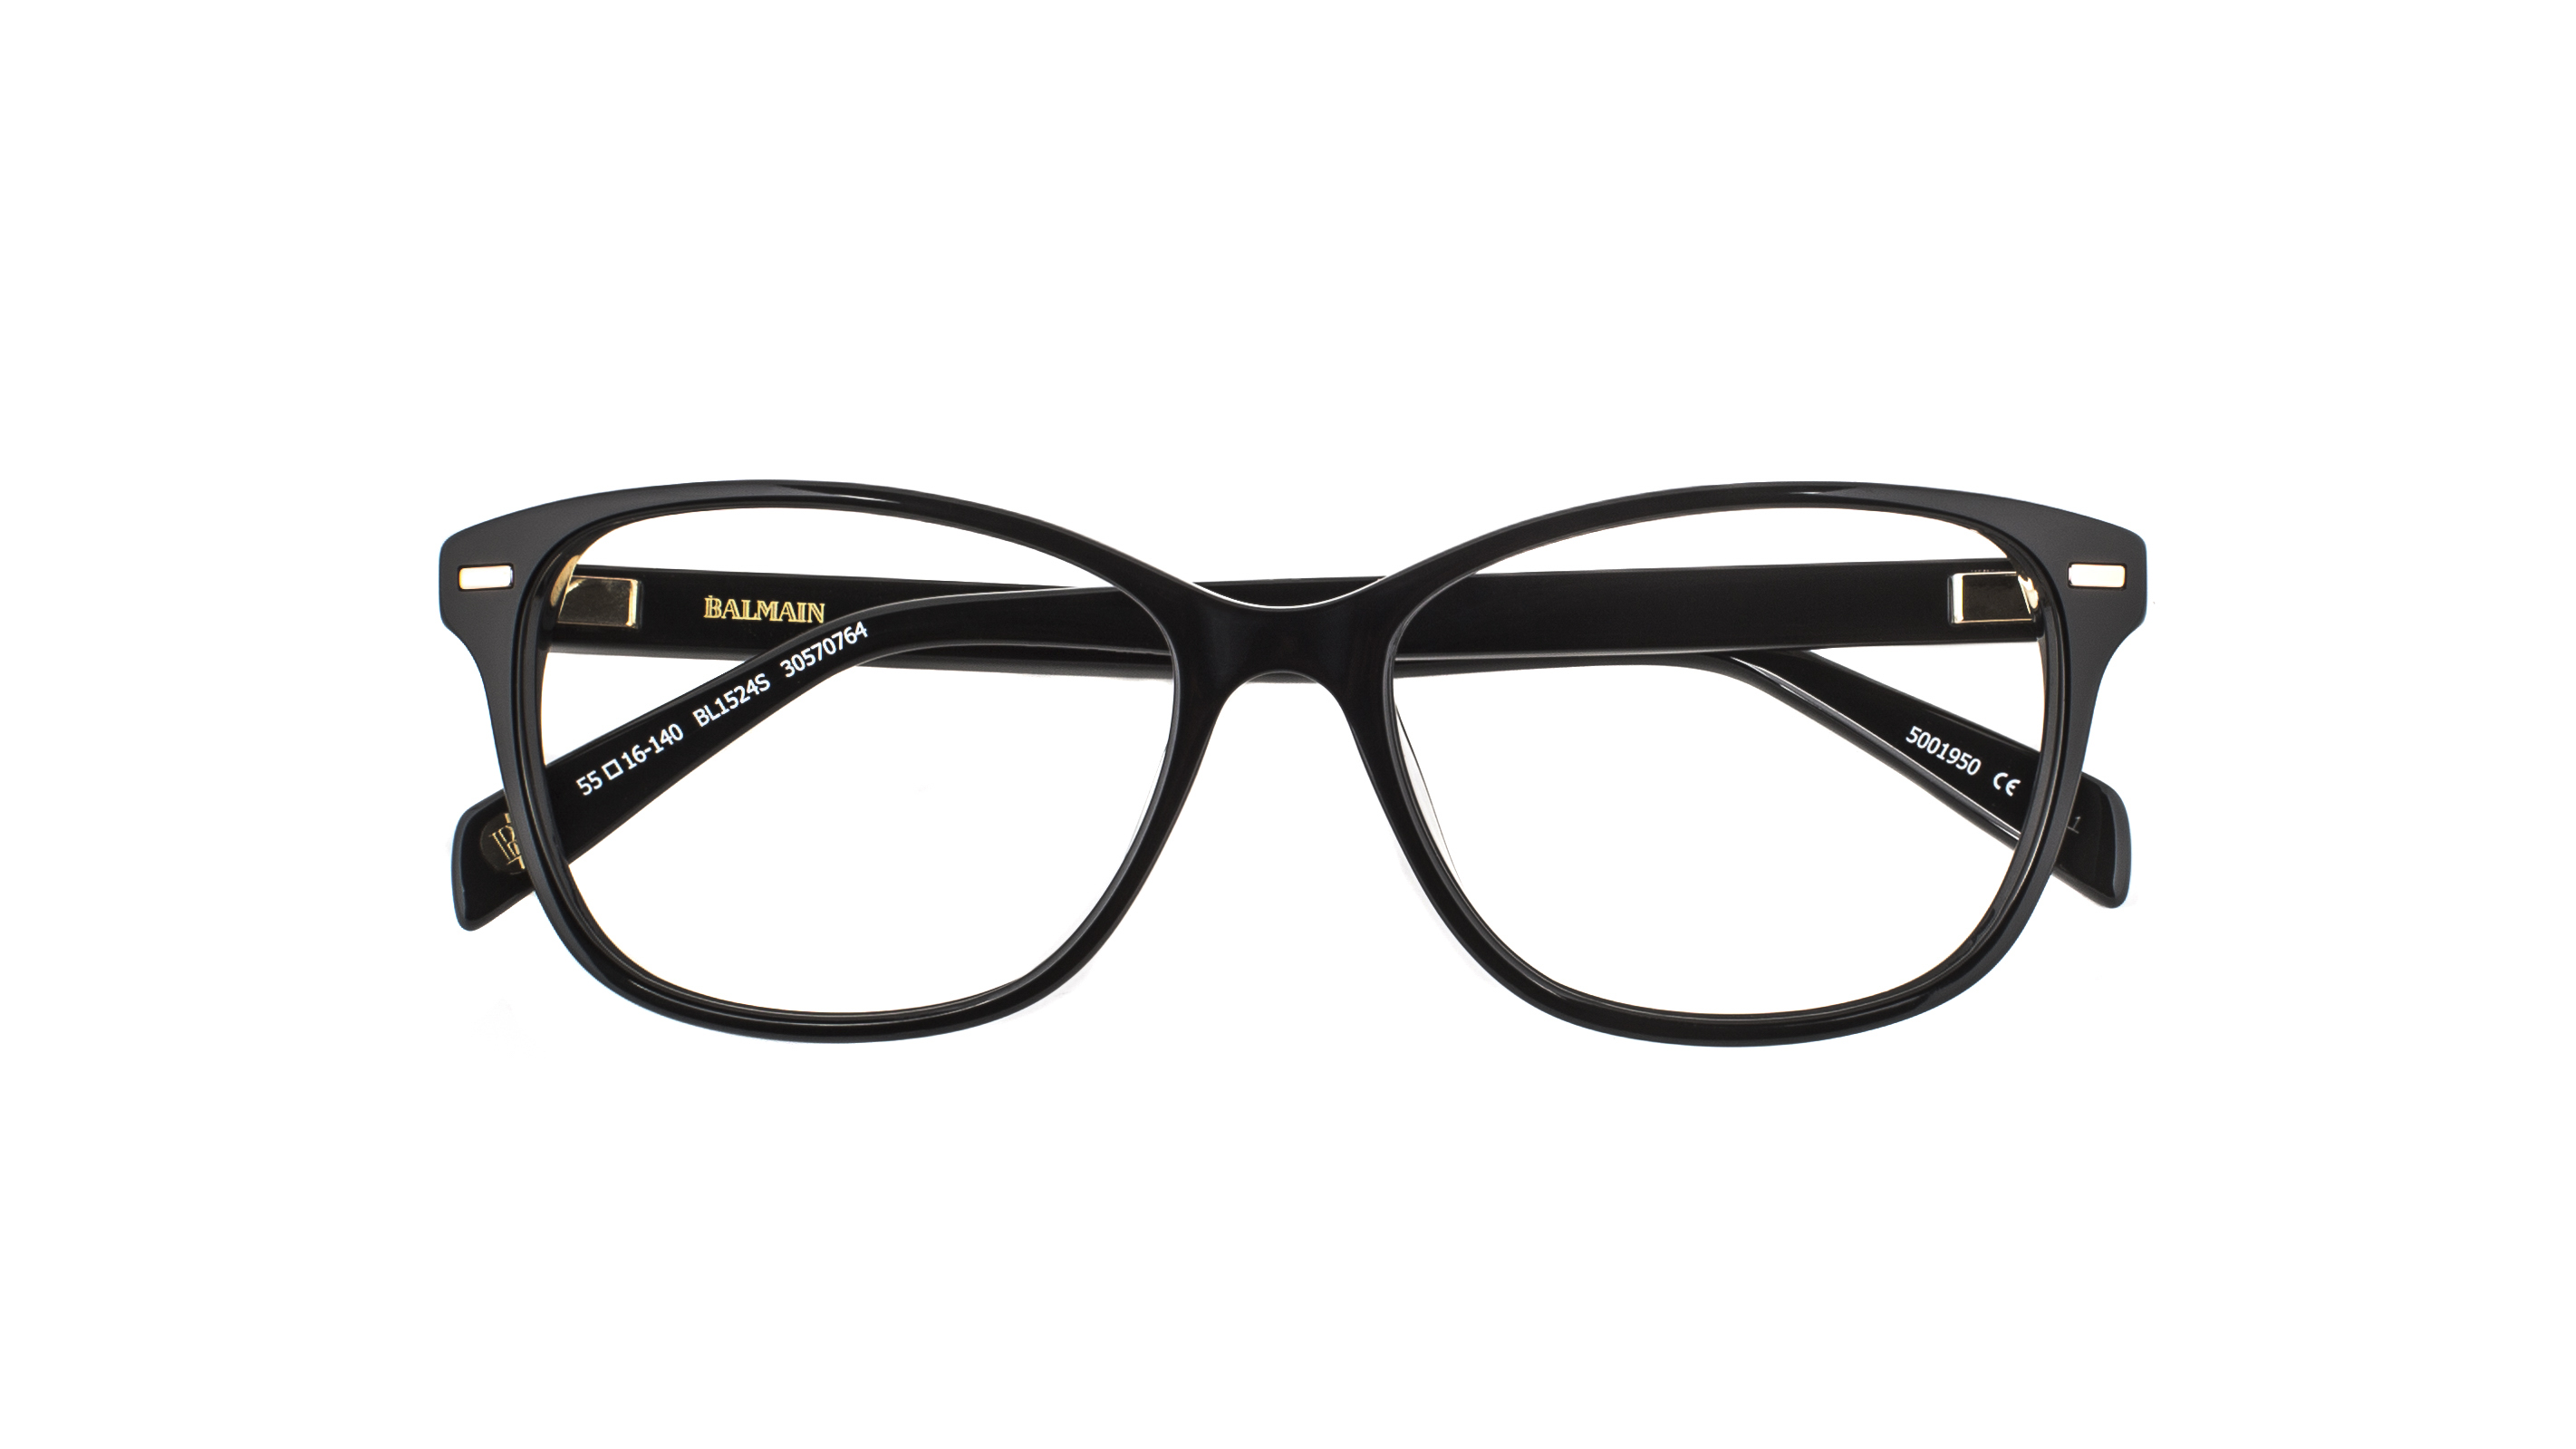 Balmain x Specsavers BL1524S 30570764 - RRP 2 pairs single vision $459